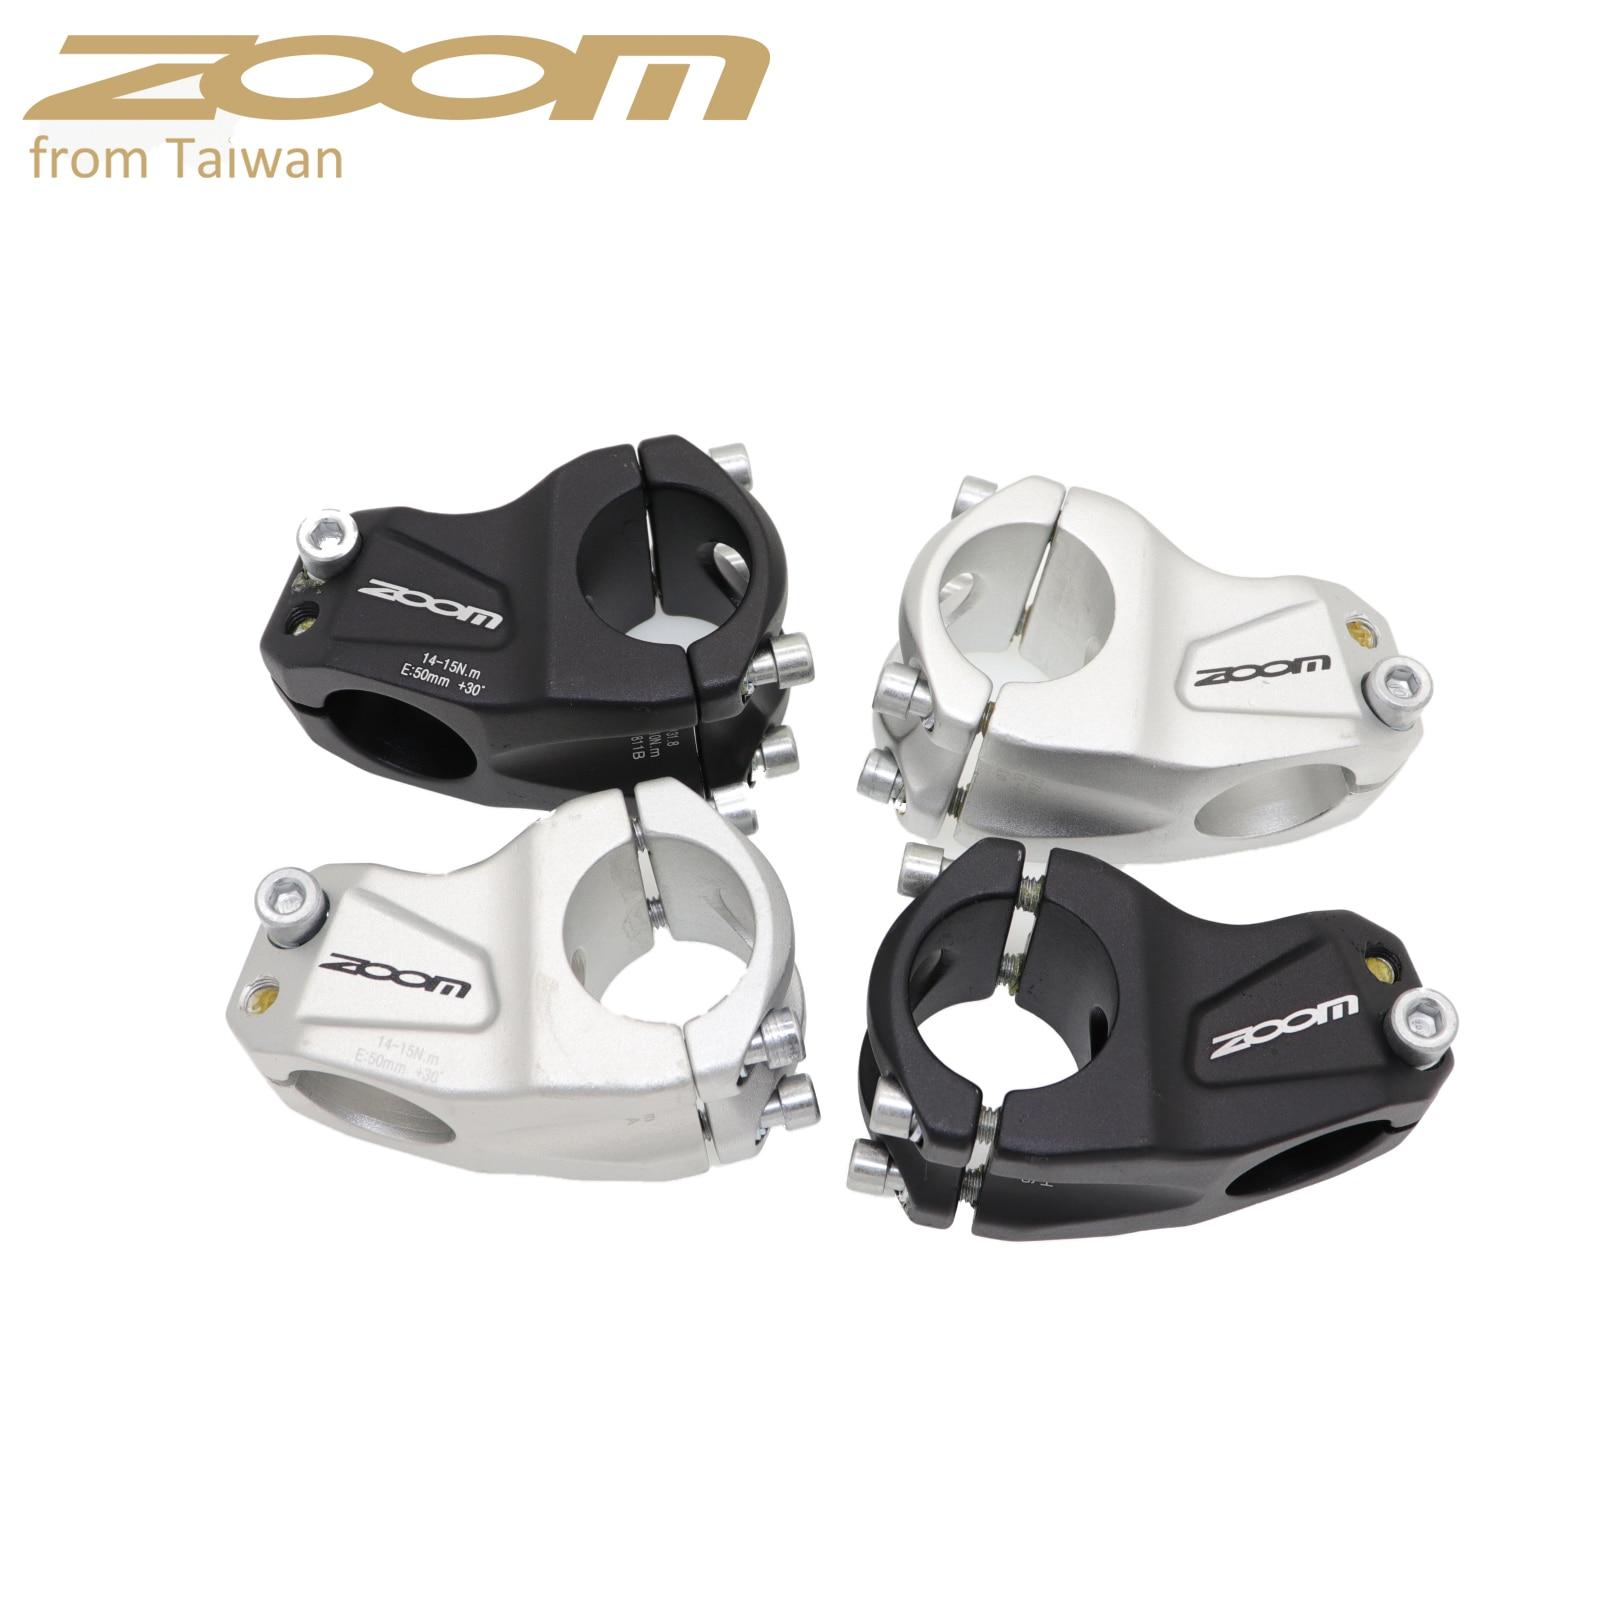 Zoom bike stem MTB downhill 30 degree cross country DH FR XC BMX mountain bike bicycle 31.8 50MM short for AM handlebar